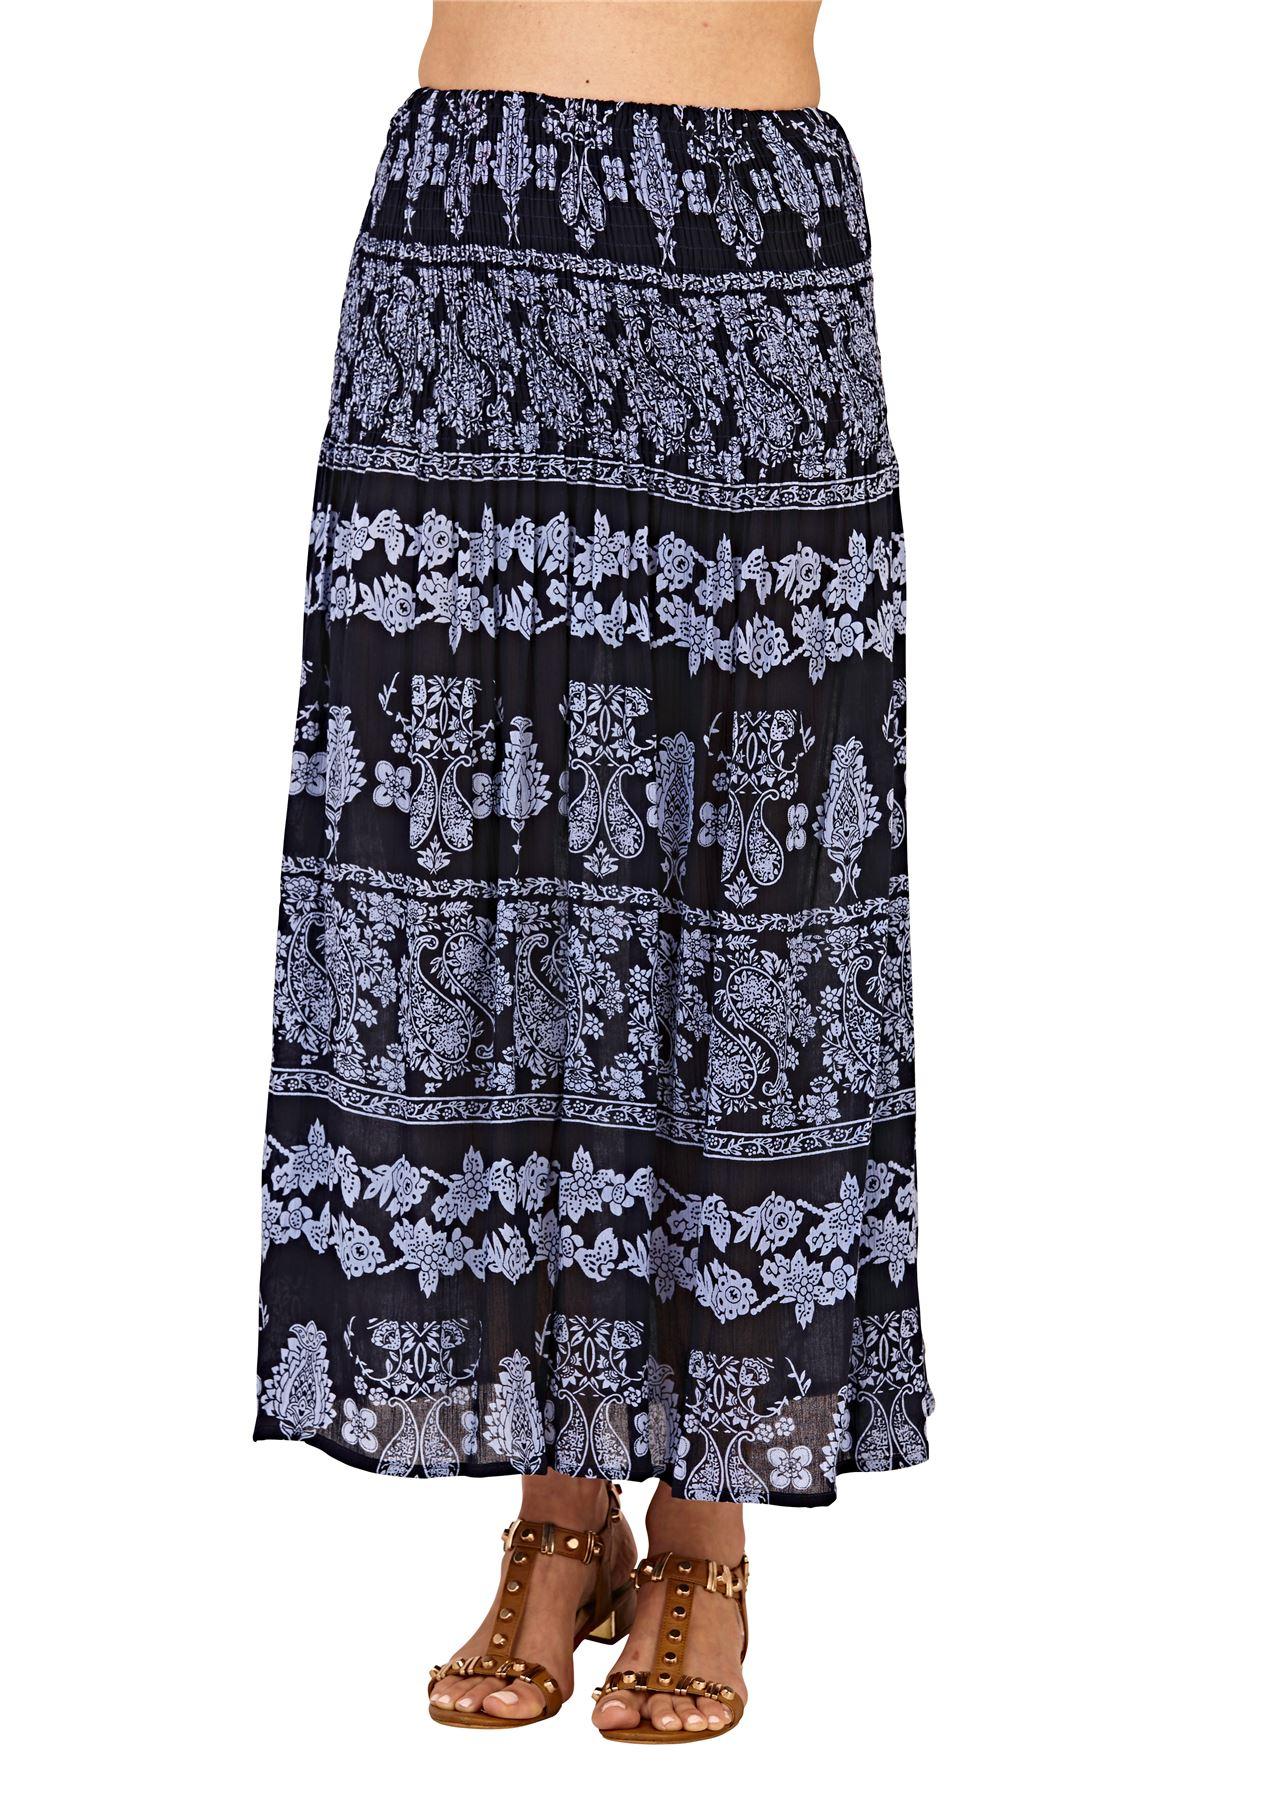 Ladies Pistachio Viscose 3 Way Halter//Bandeau//Skirt Summer//Beach Dresses